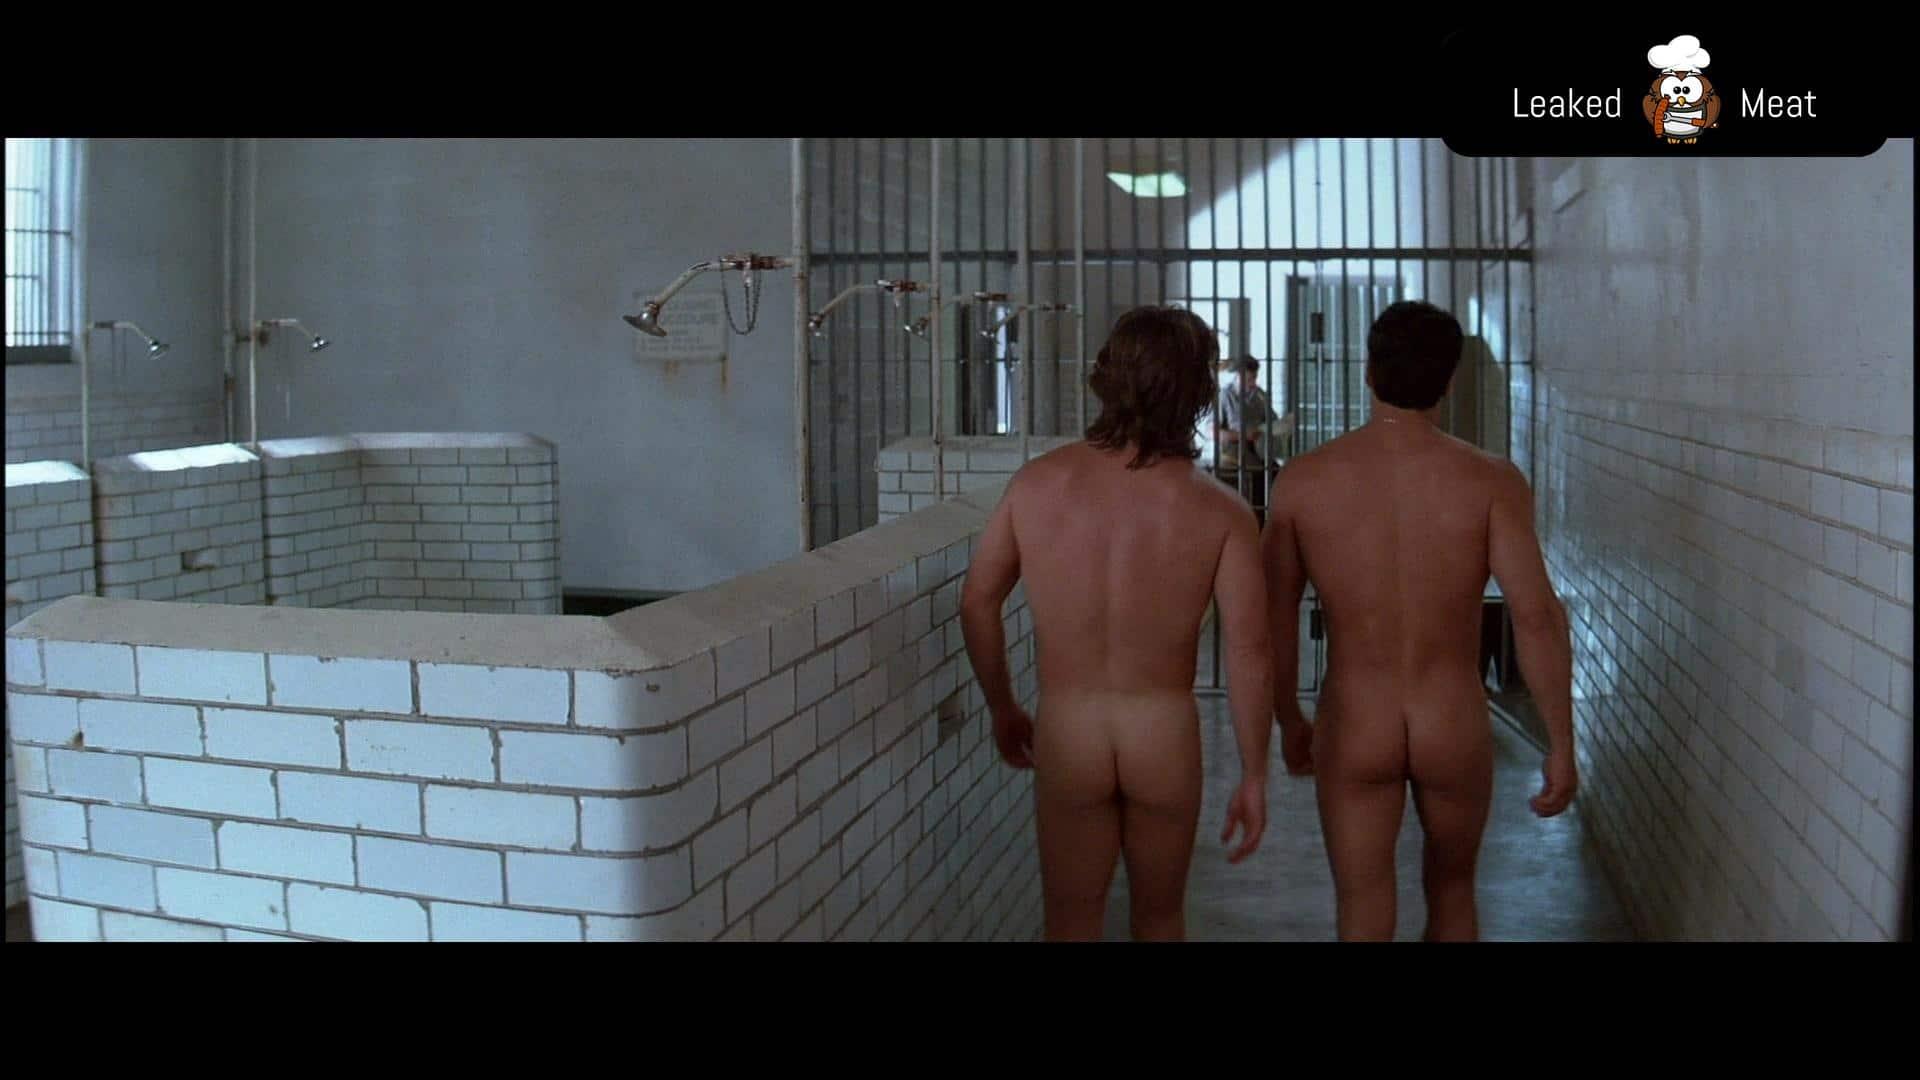 Sylvester Stallone | LeakedMeat 35